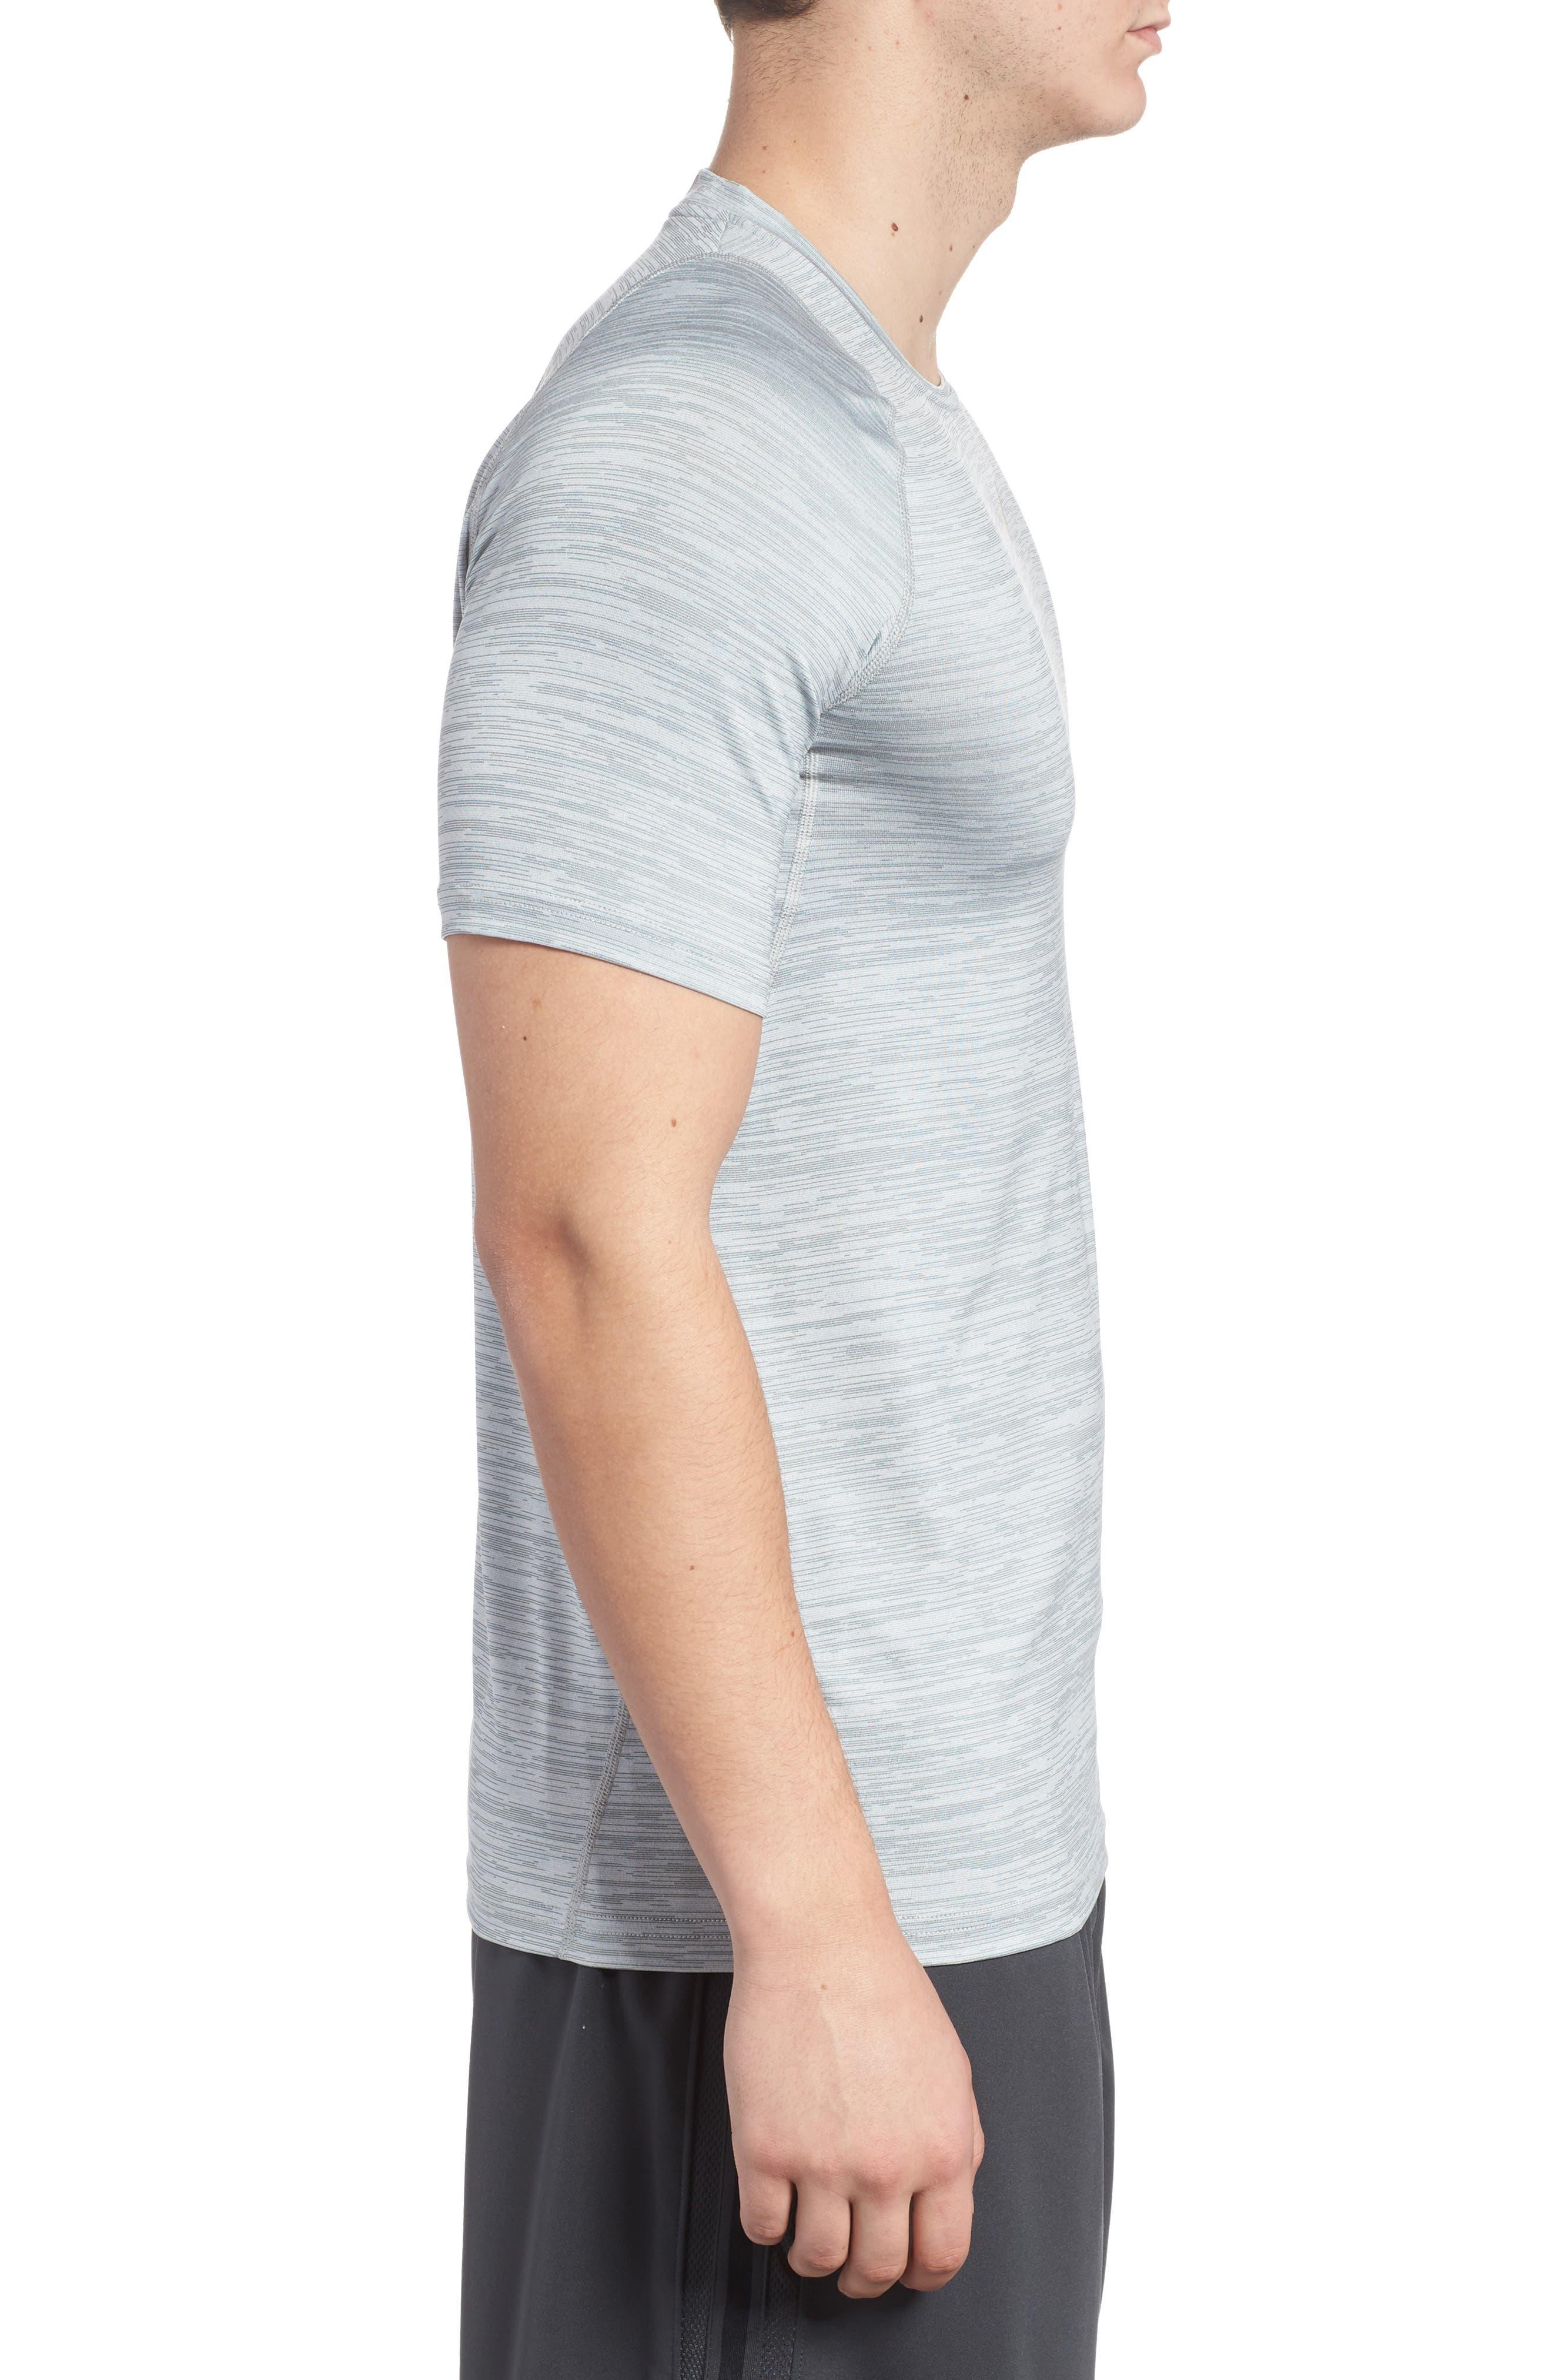 Training Top Crewneck T-Shirt,                             Alternate thumbnail 3, color,                             Cool Grey/ White/ Black